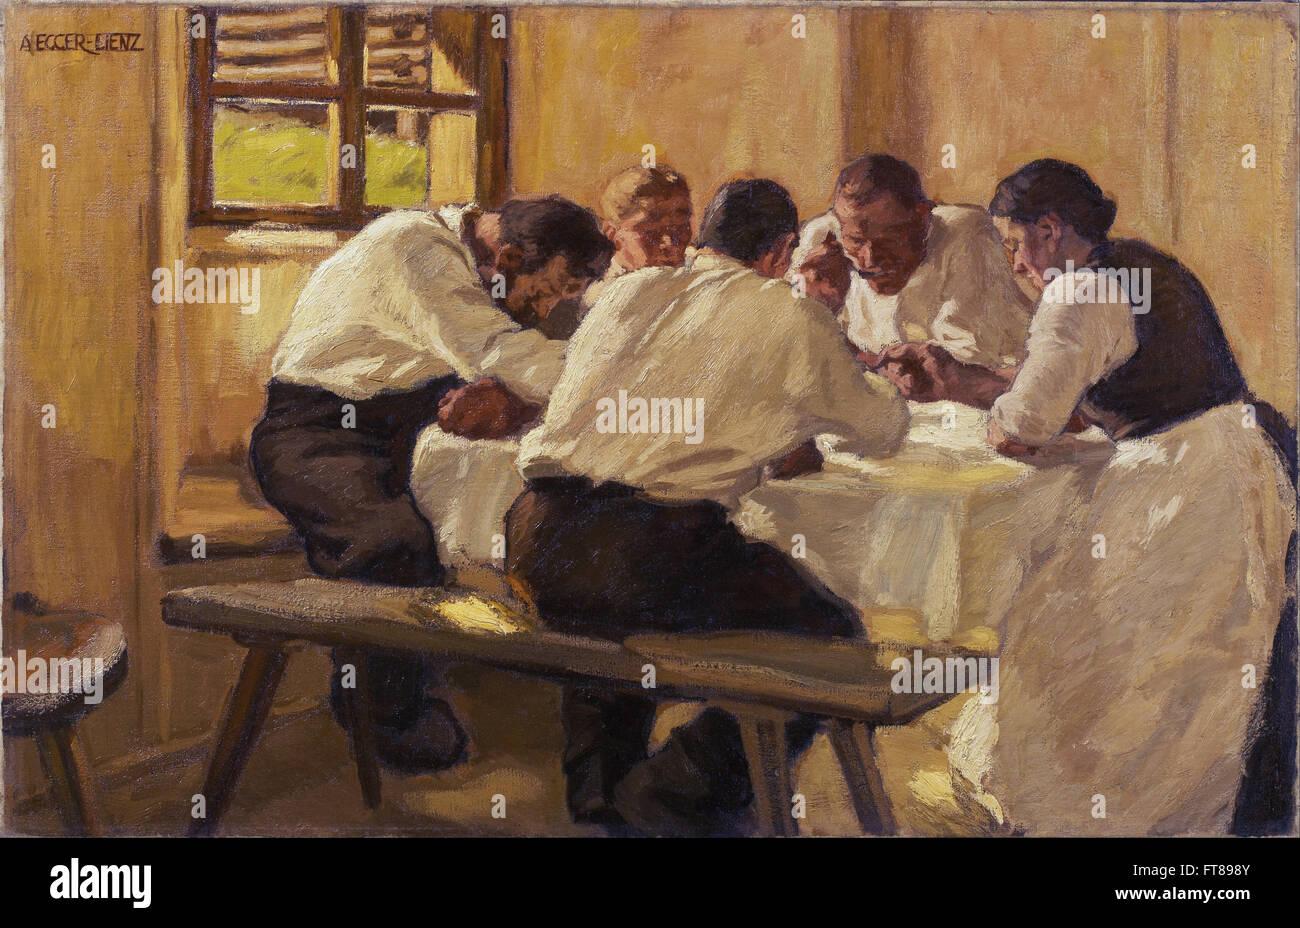 Albin Egger-Lienz - Lunch (The Soup, Version II) -  Leopold Museum, Vienna - Stock Image